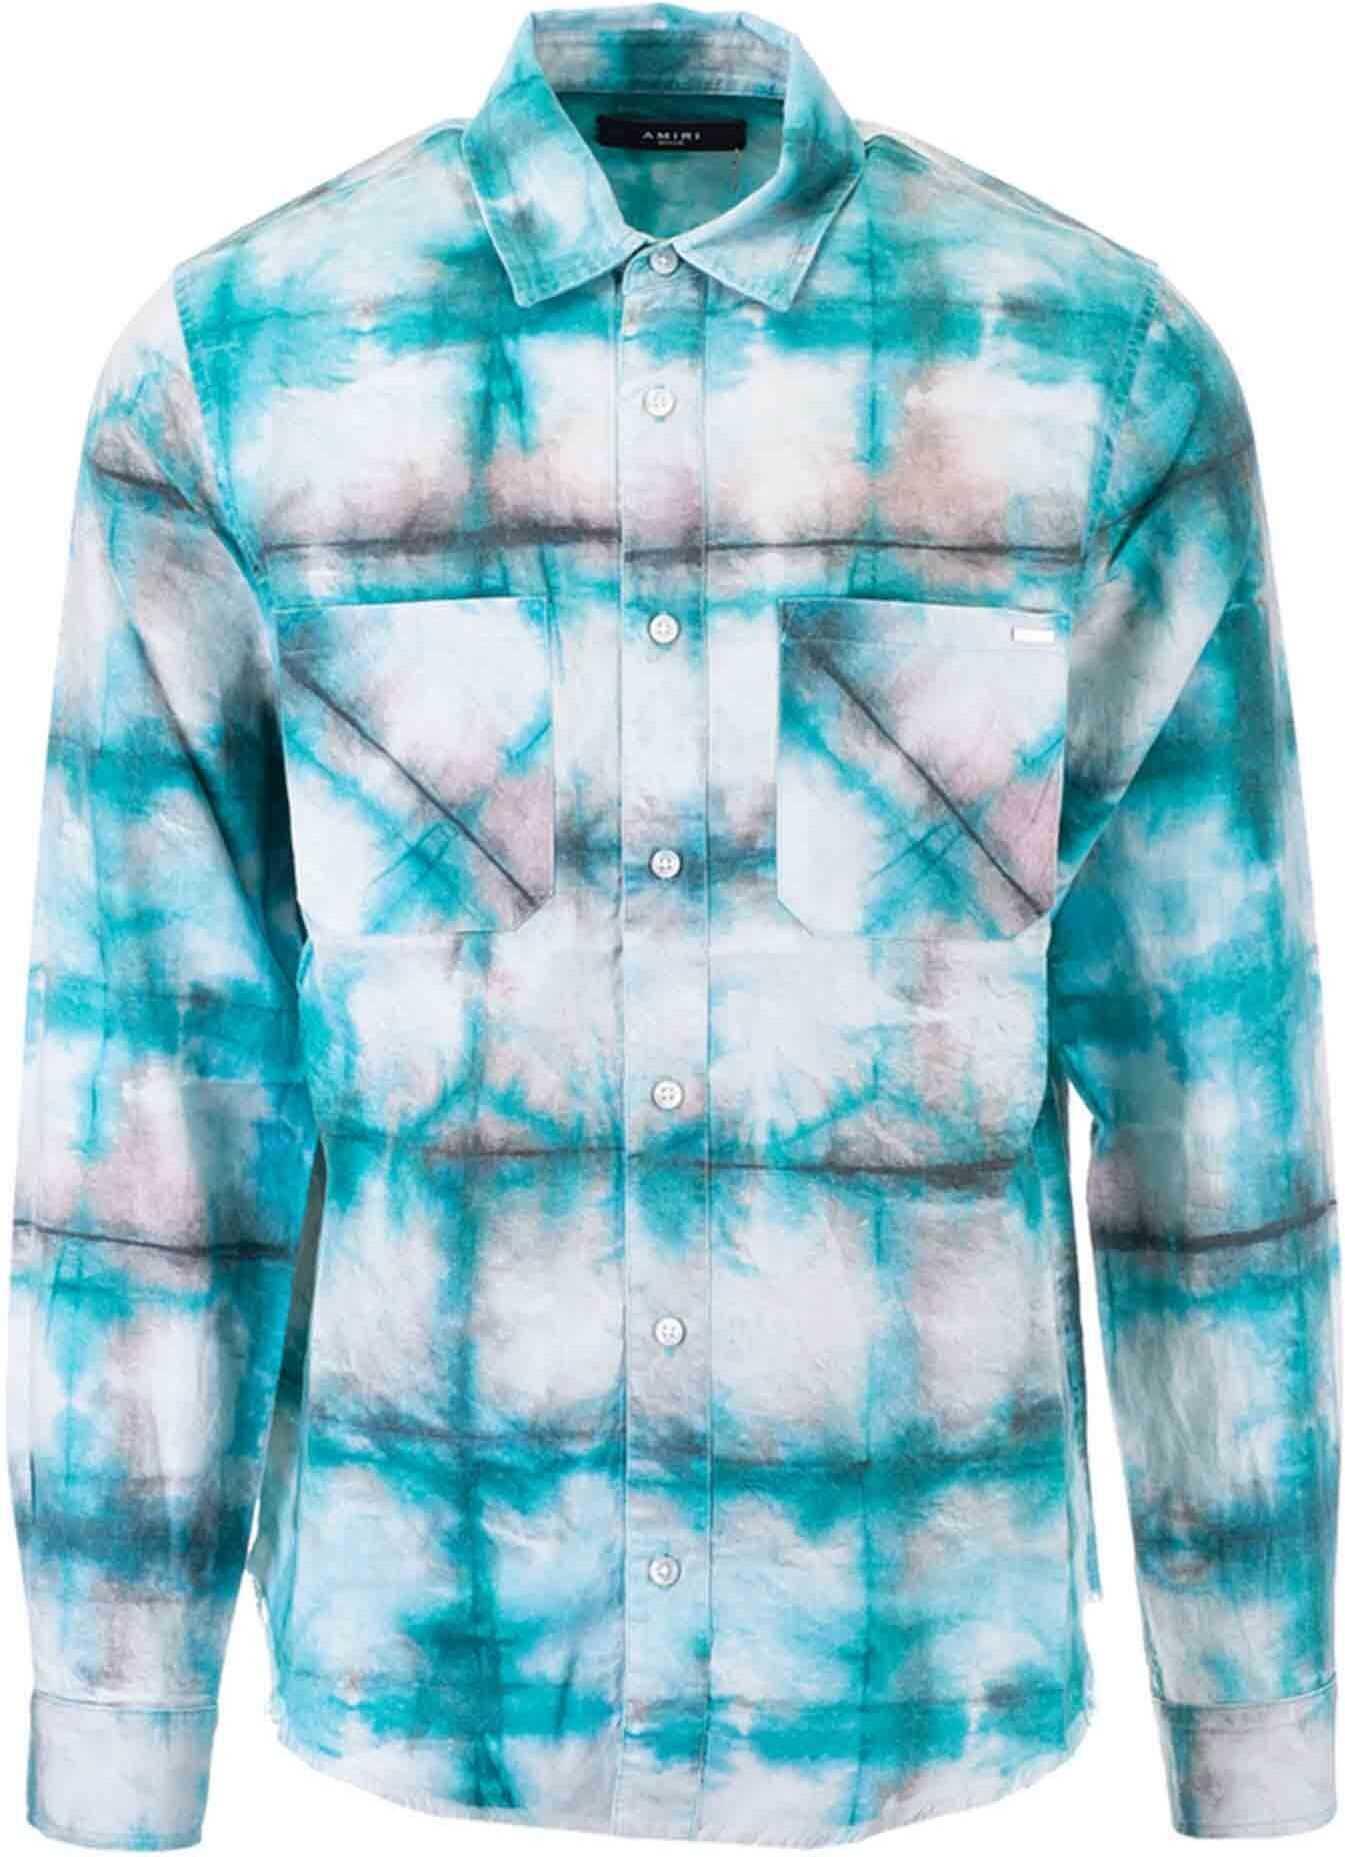 AMIRI Watercolor Plaid Shirt In Blue Blue imagine